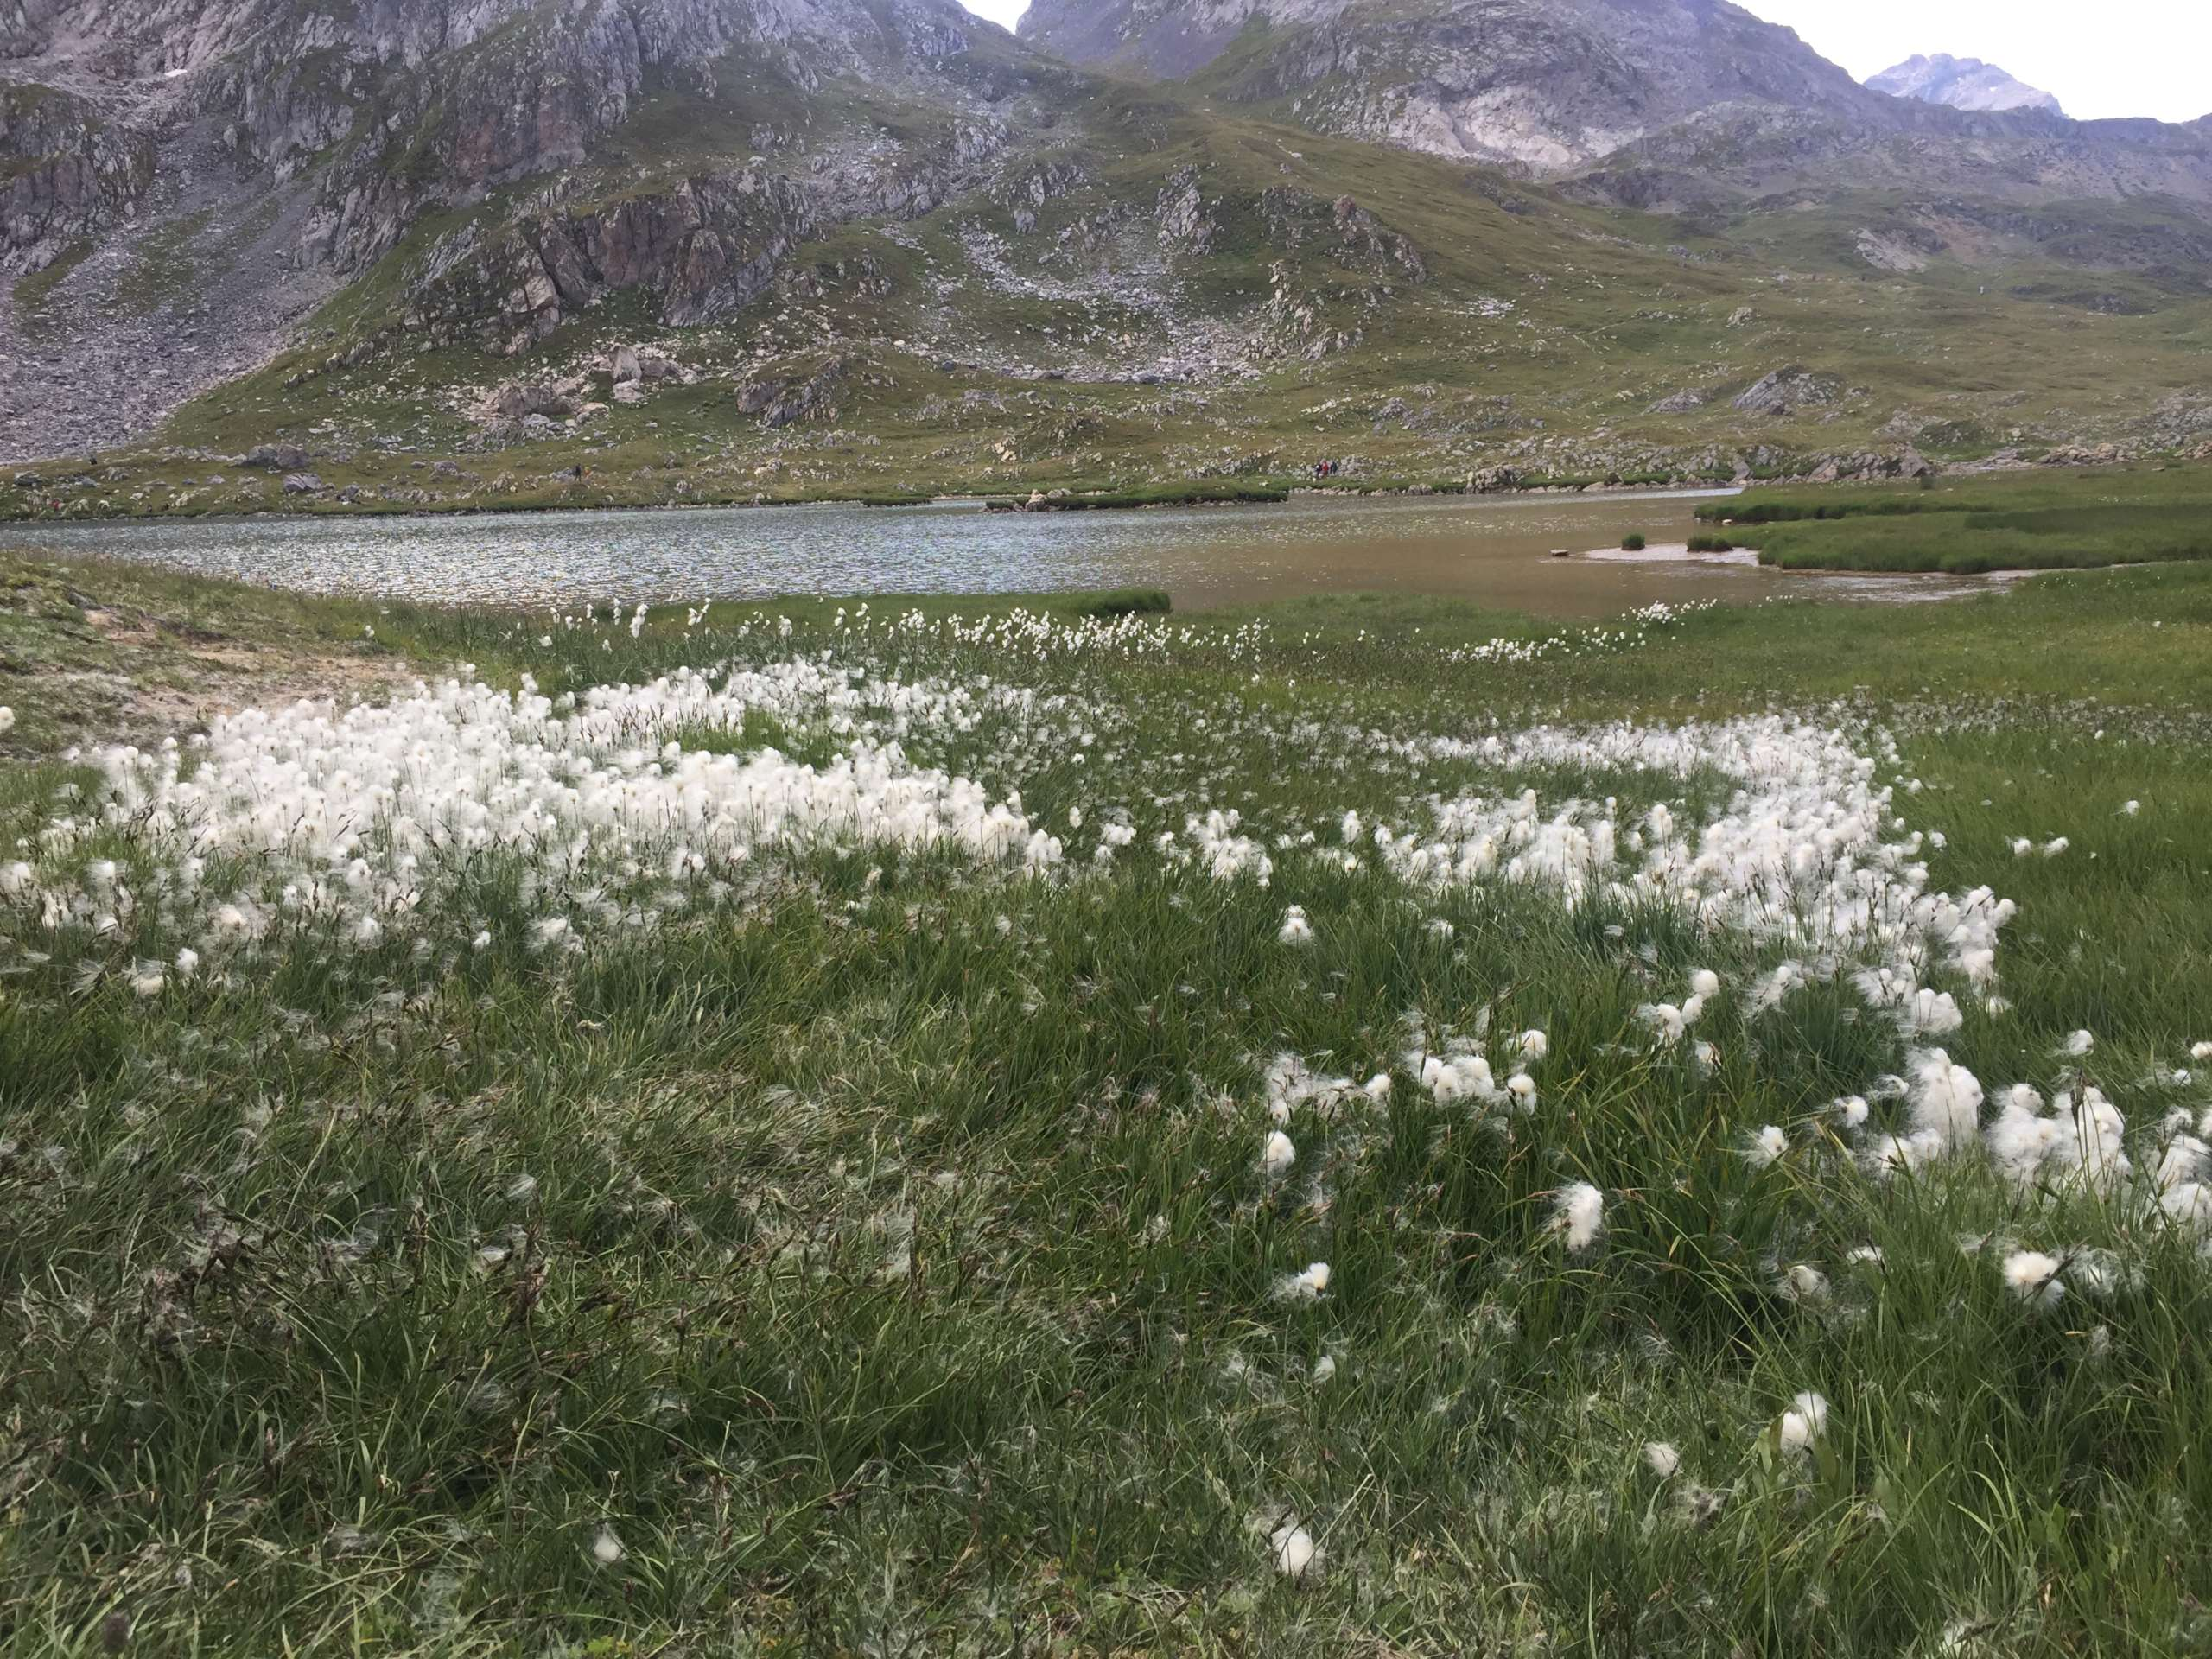 Petites balades en Rhône-Alpes - Page 2 Img_1519